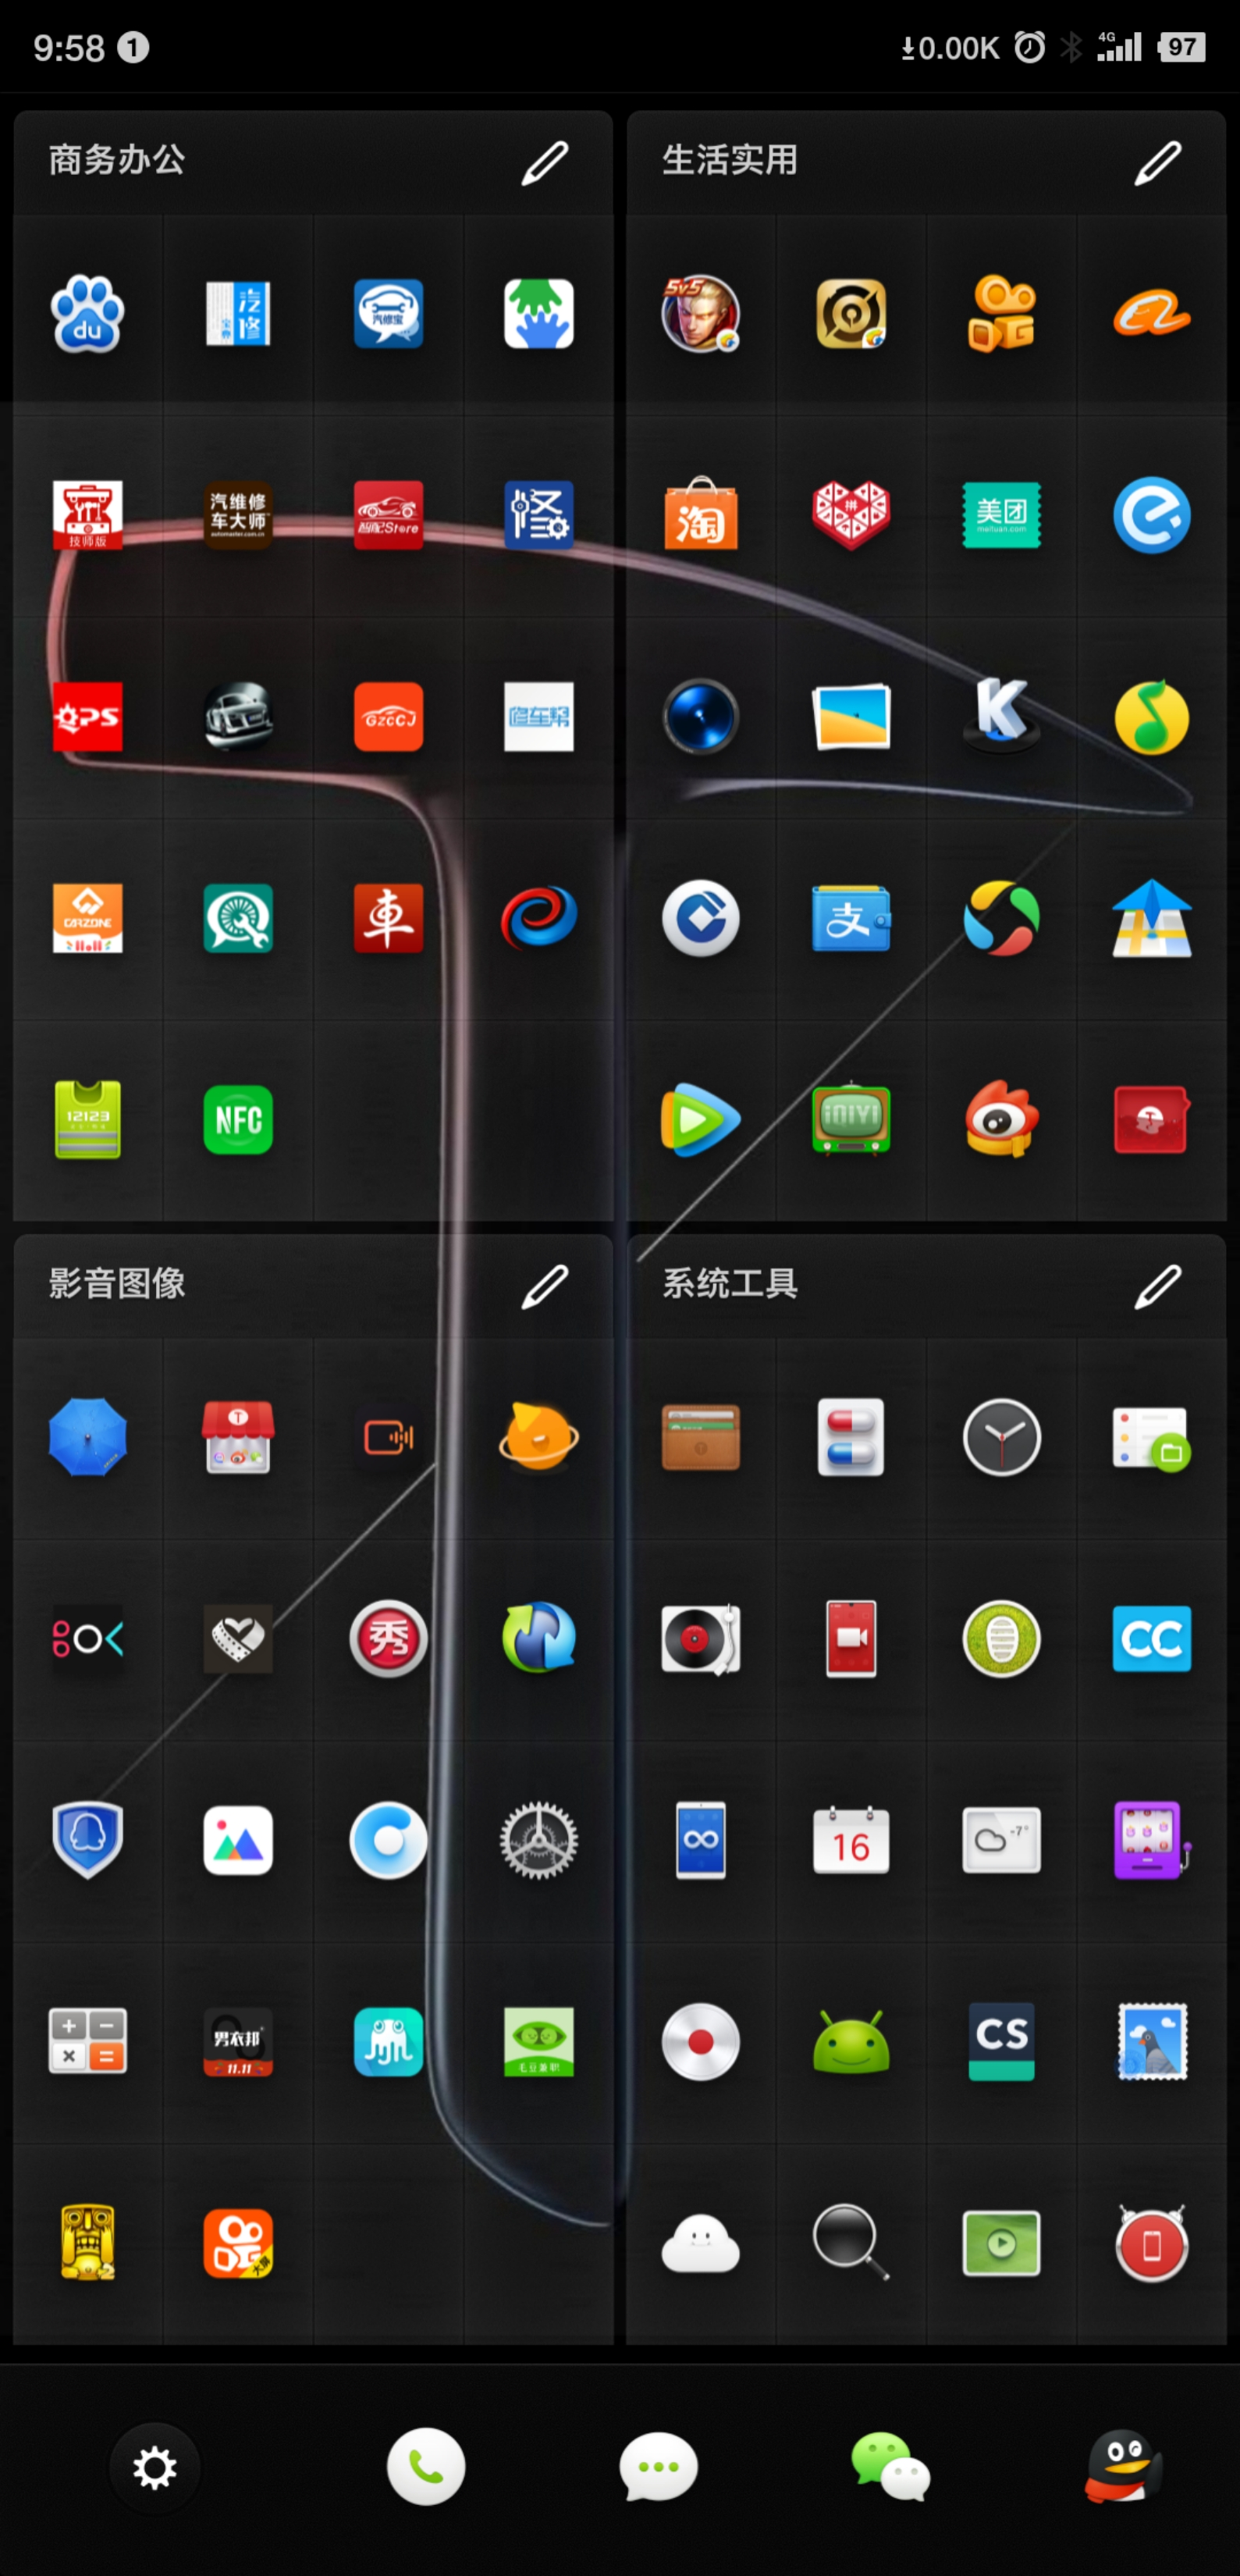 Screenshot_2019-12-16-09-58-43-239_??.png